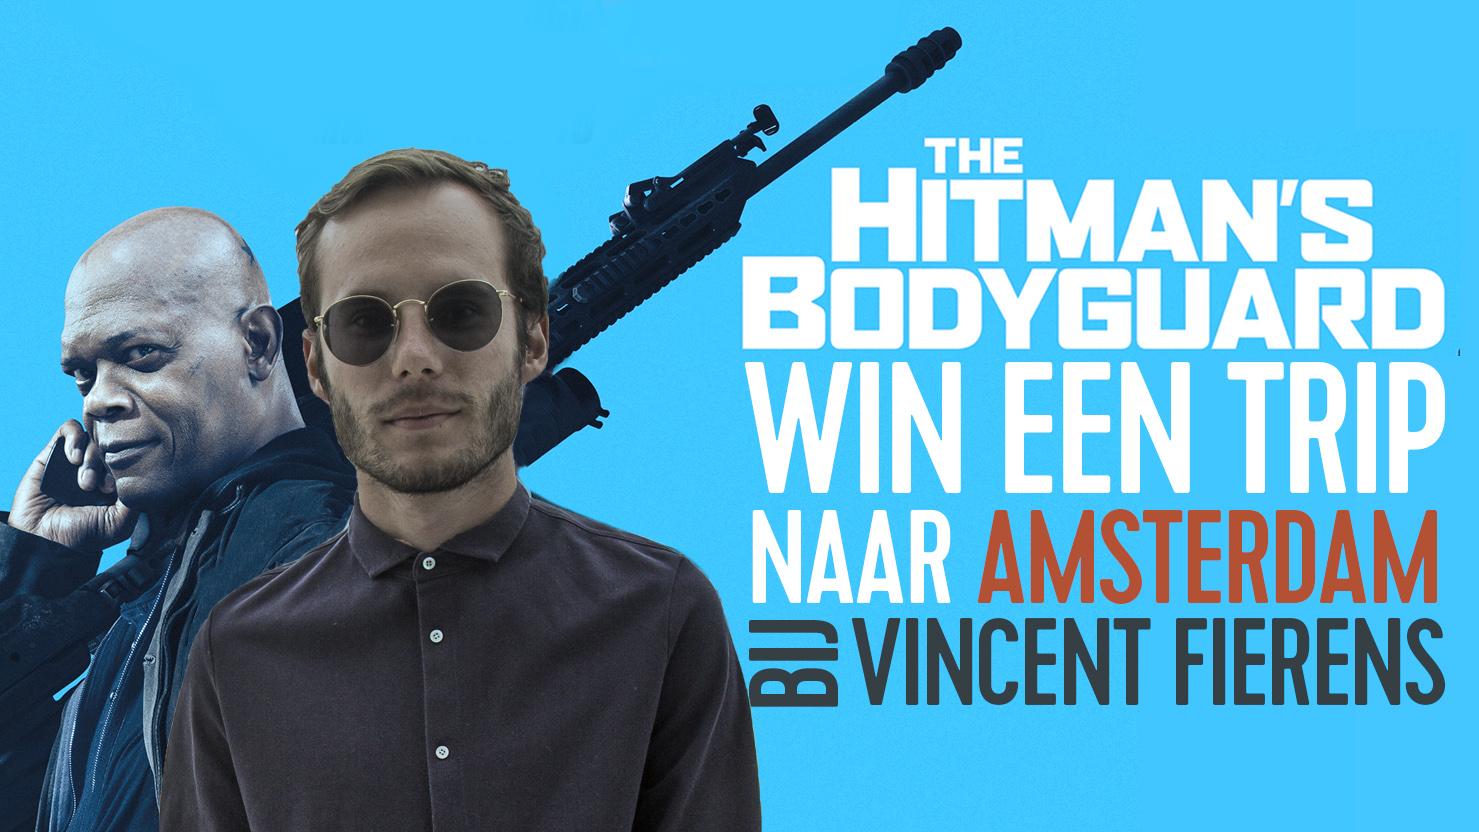 Vincentfierens hitman